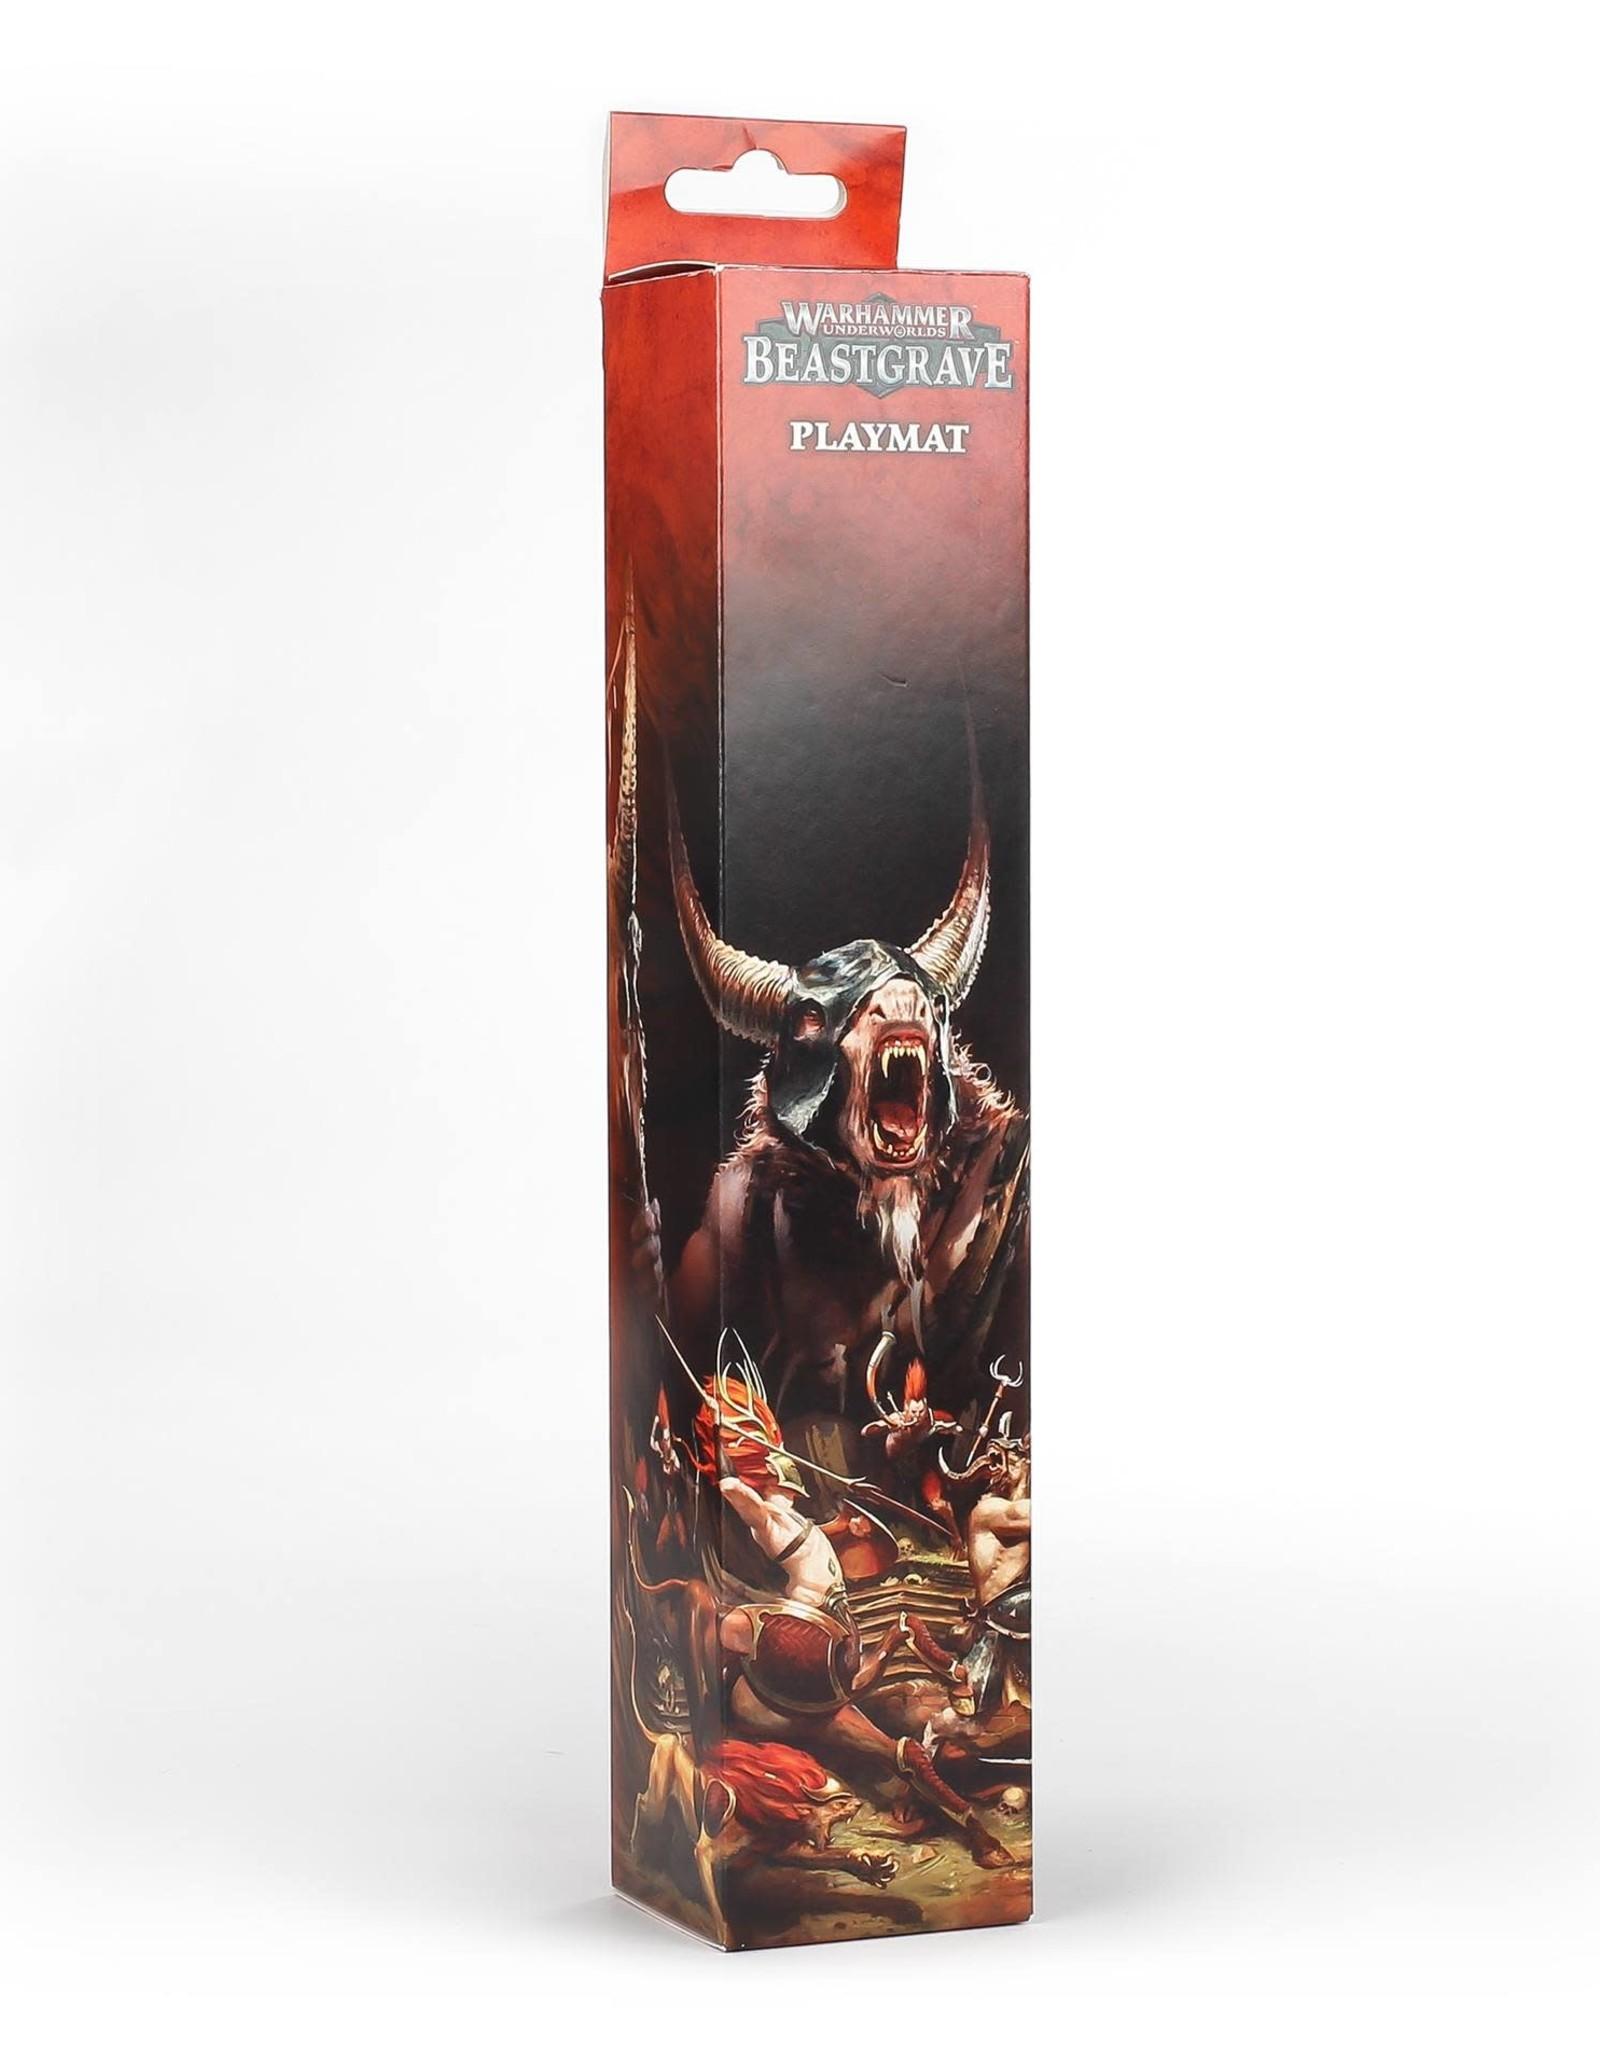 Warhammer Underworlds Warhammer Underworlds: Beastgrave Playmat